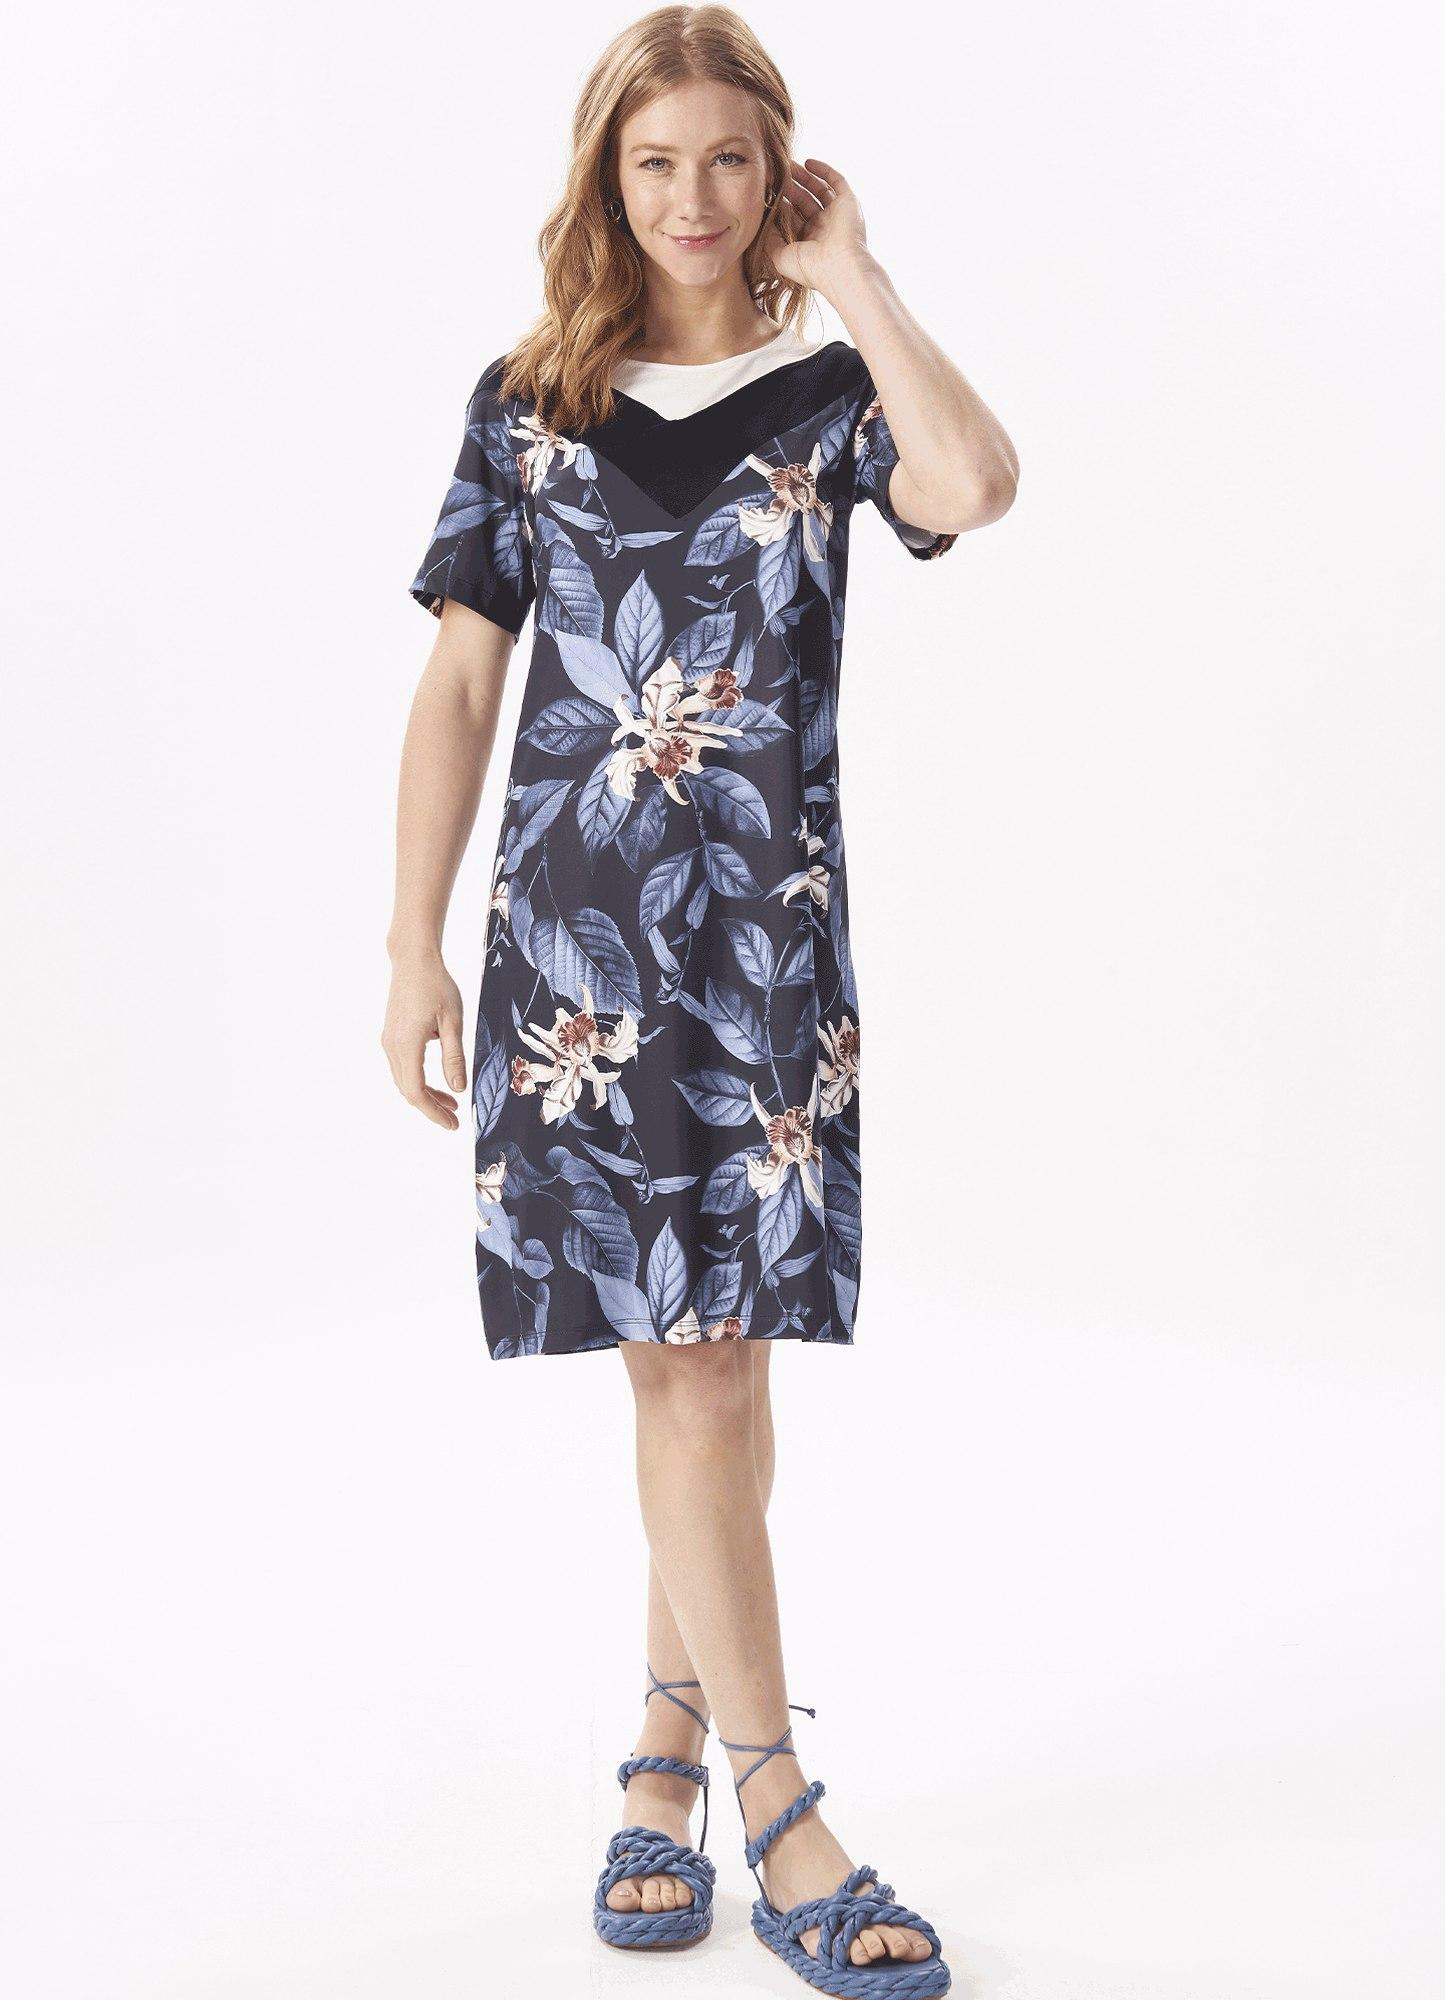 Vestido Feminino Plus Size Malha Reto Estampa Floral Decote Liso